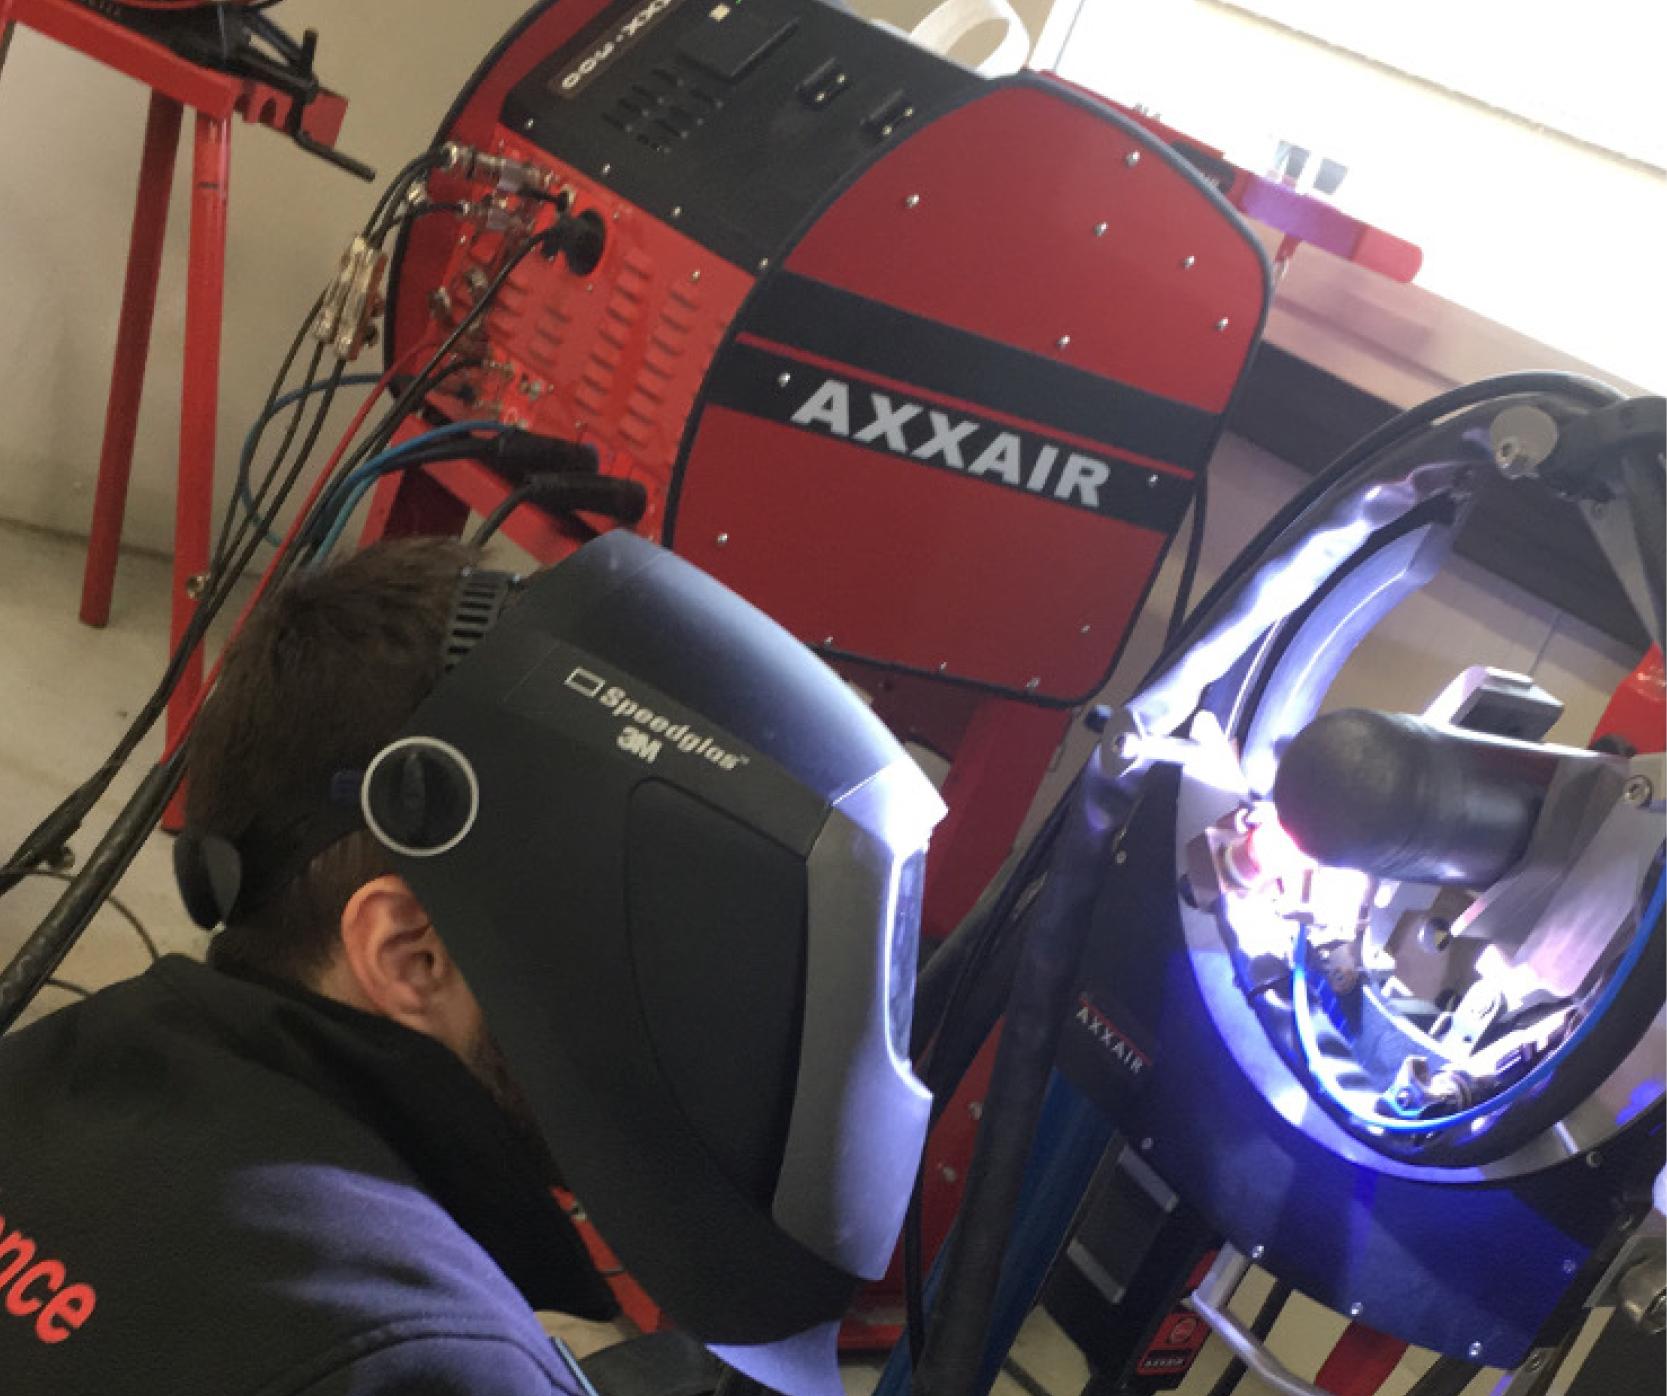 Welding procedure qualification to guarantee quality welds